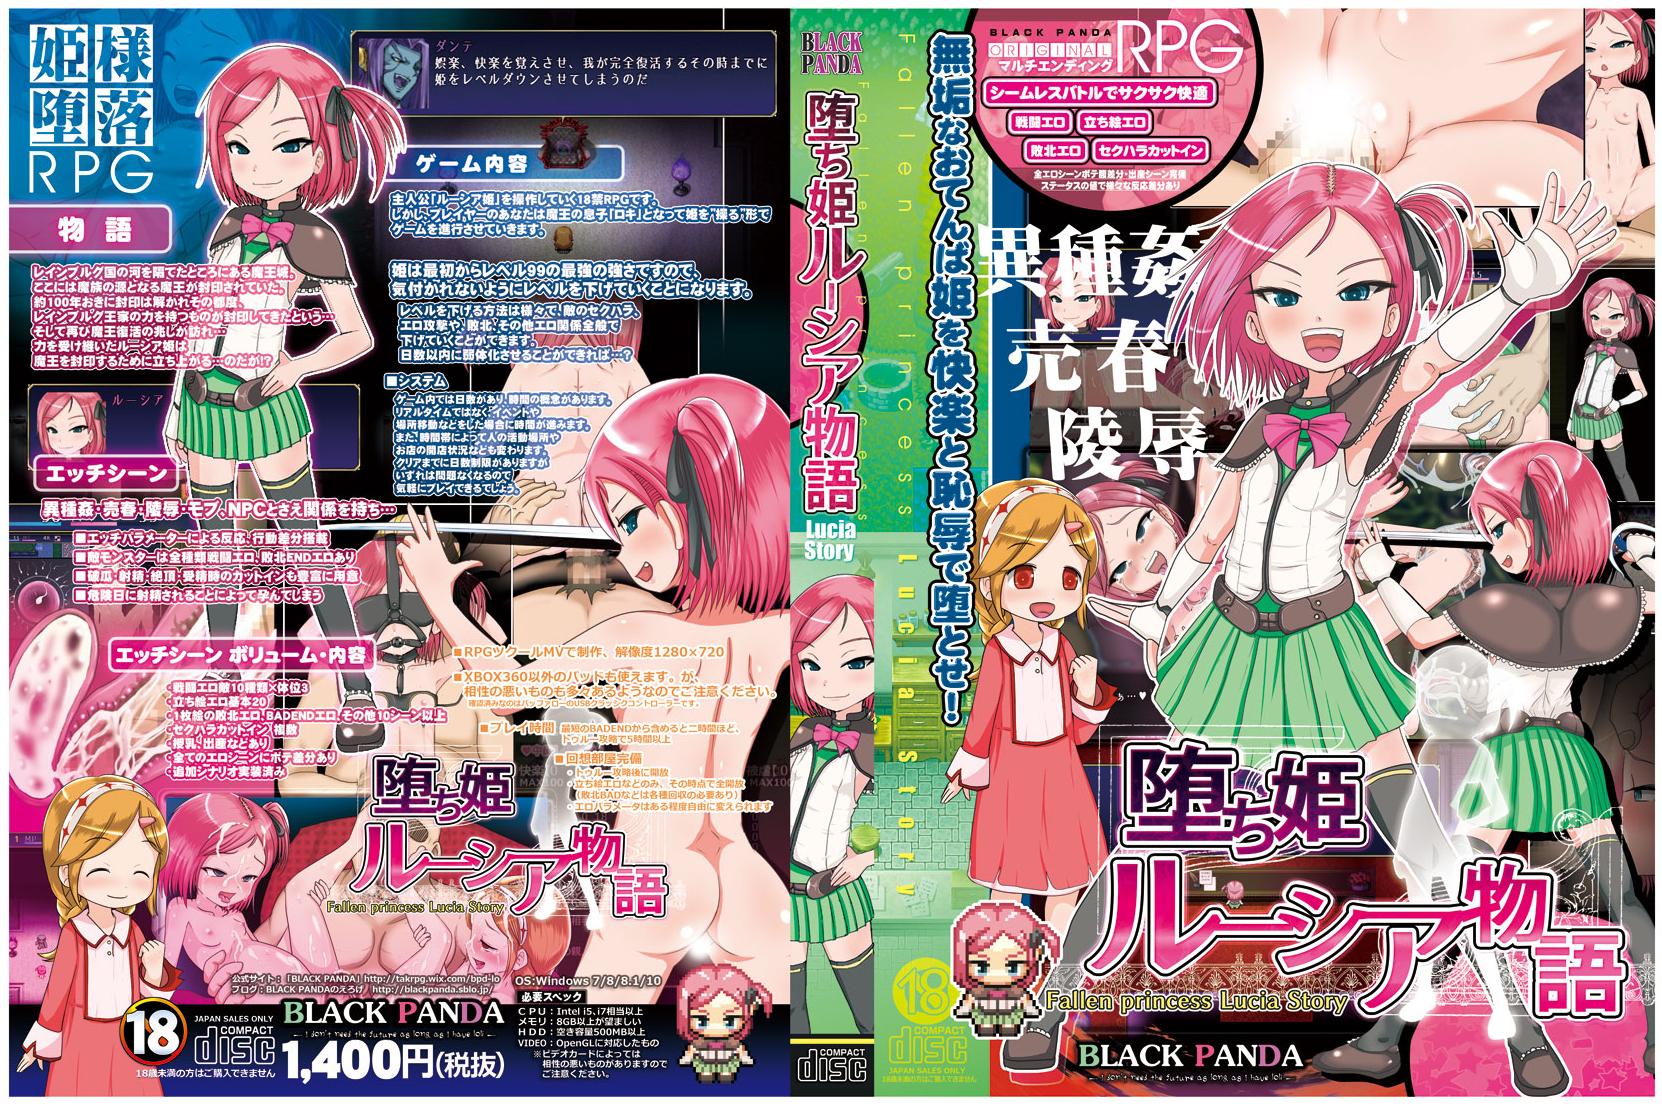 ochihime-pac-mini2.jpg